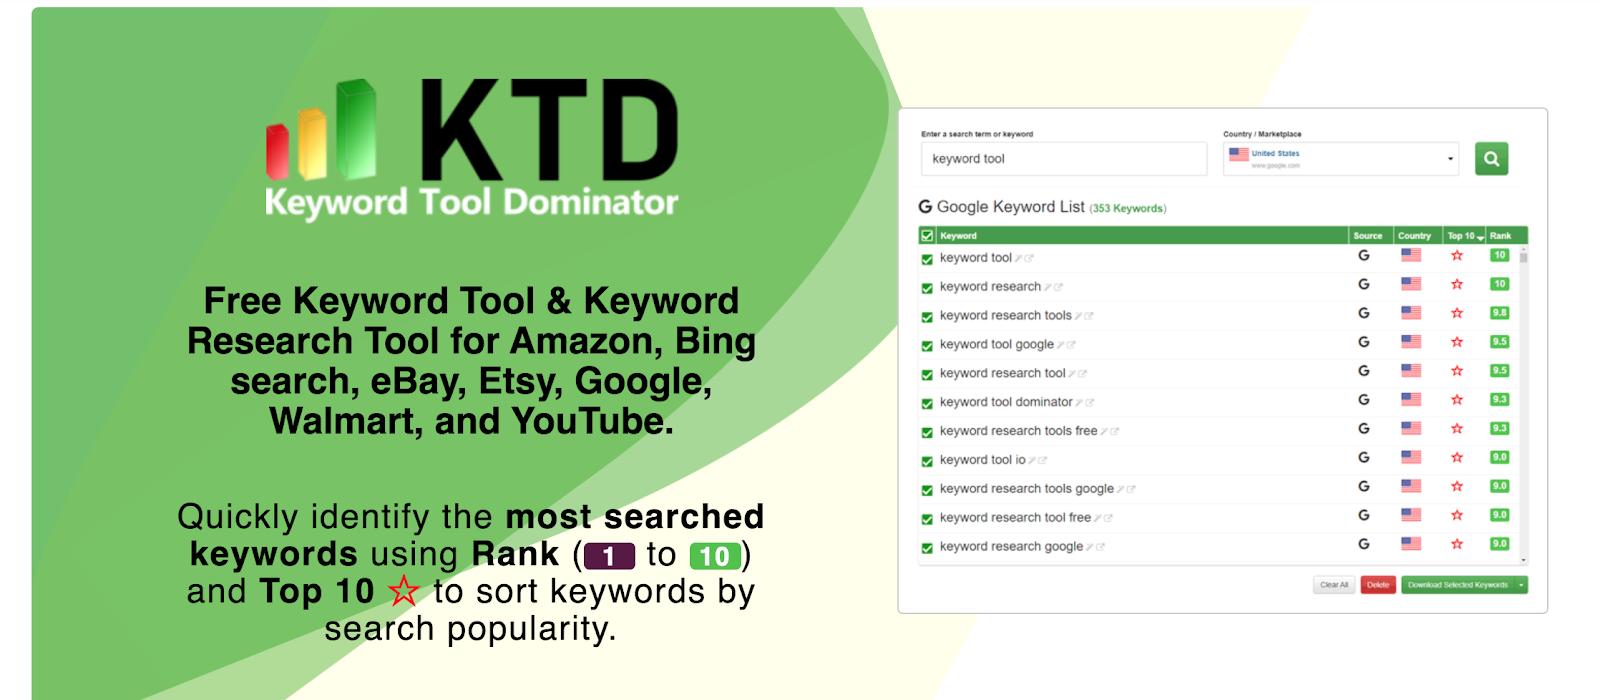 Keyword Tool Dominator - Best Free Keyword Research Tools